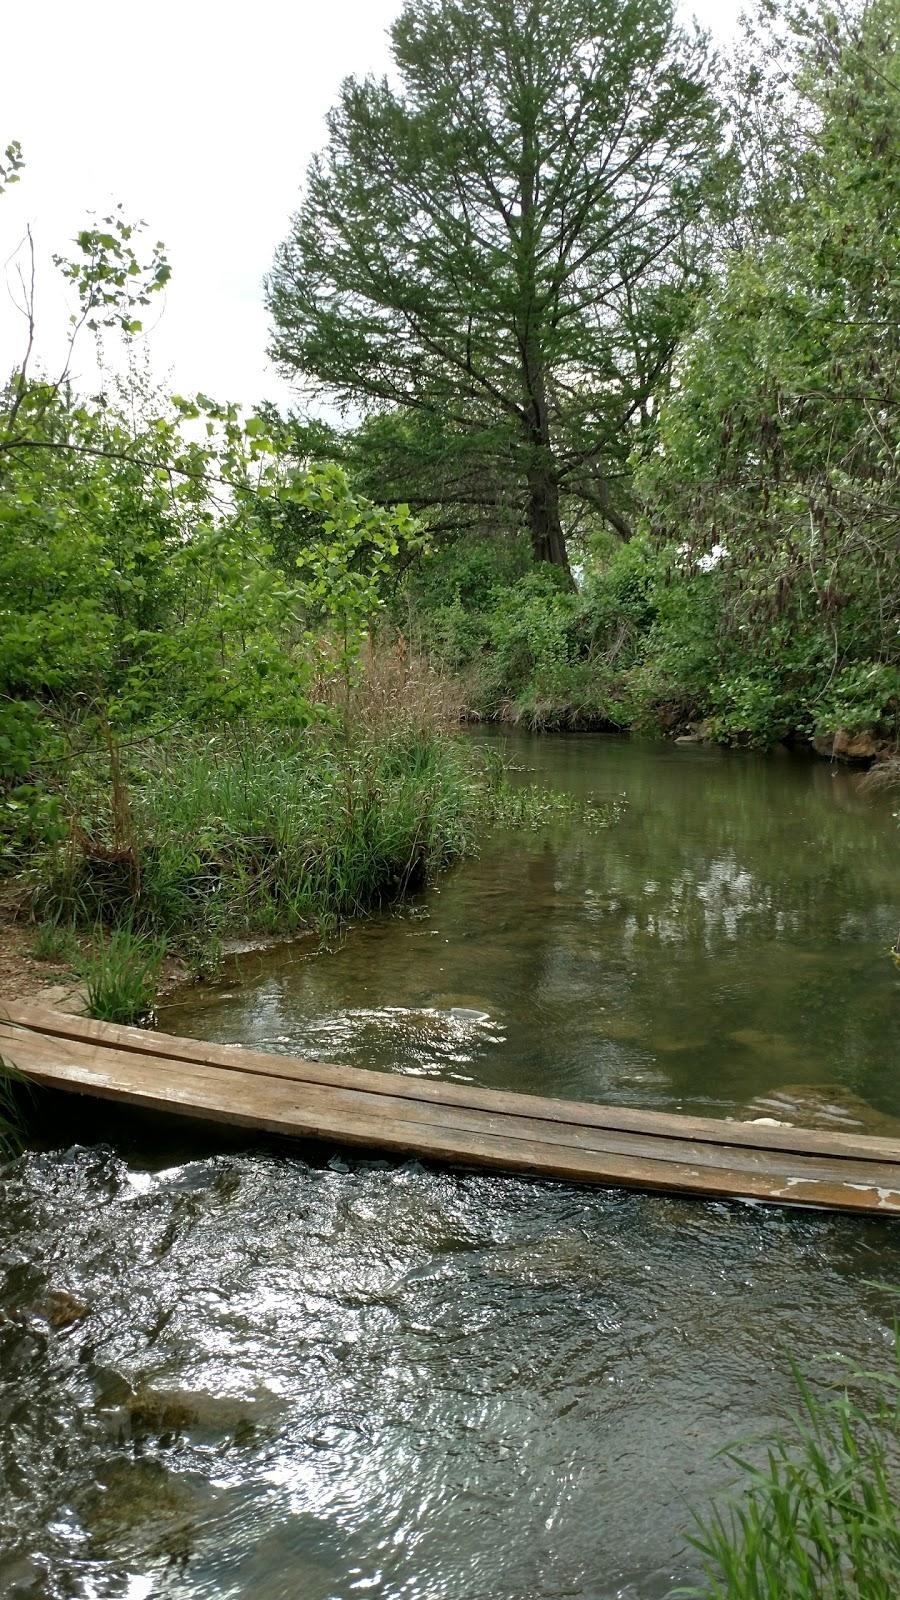 Lady Bird Johnson Municipal Park Campground - lodging  | Photo 5 of 10 | Address: 432 Lady Bird Dr, Fredericksburg, TX 78624, USA | Phone: (830) 997-4202